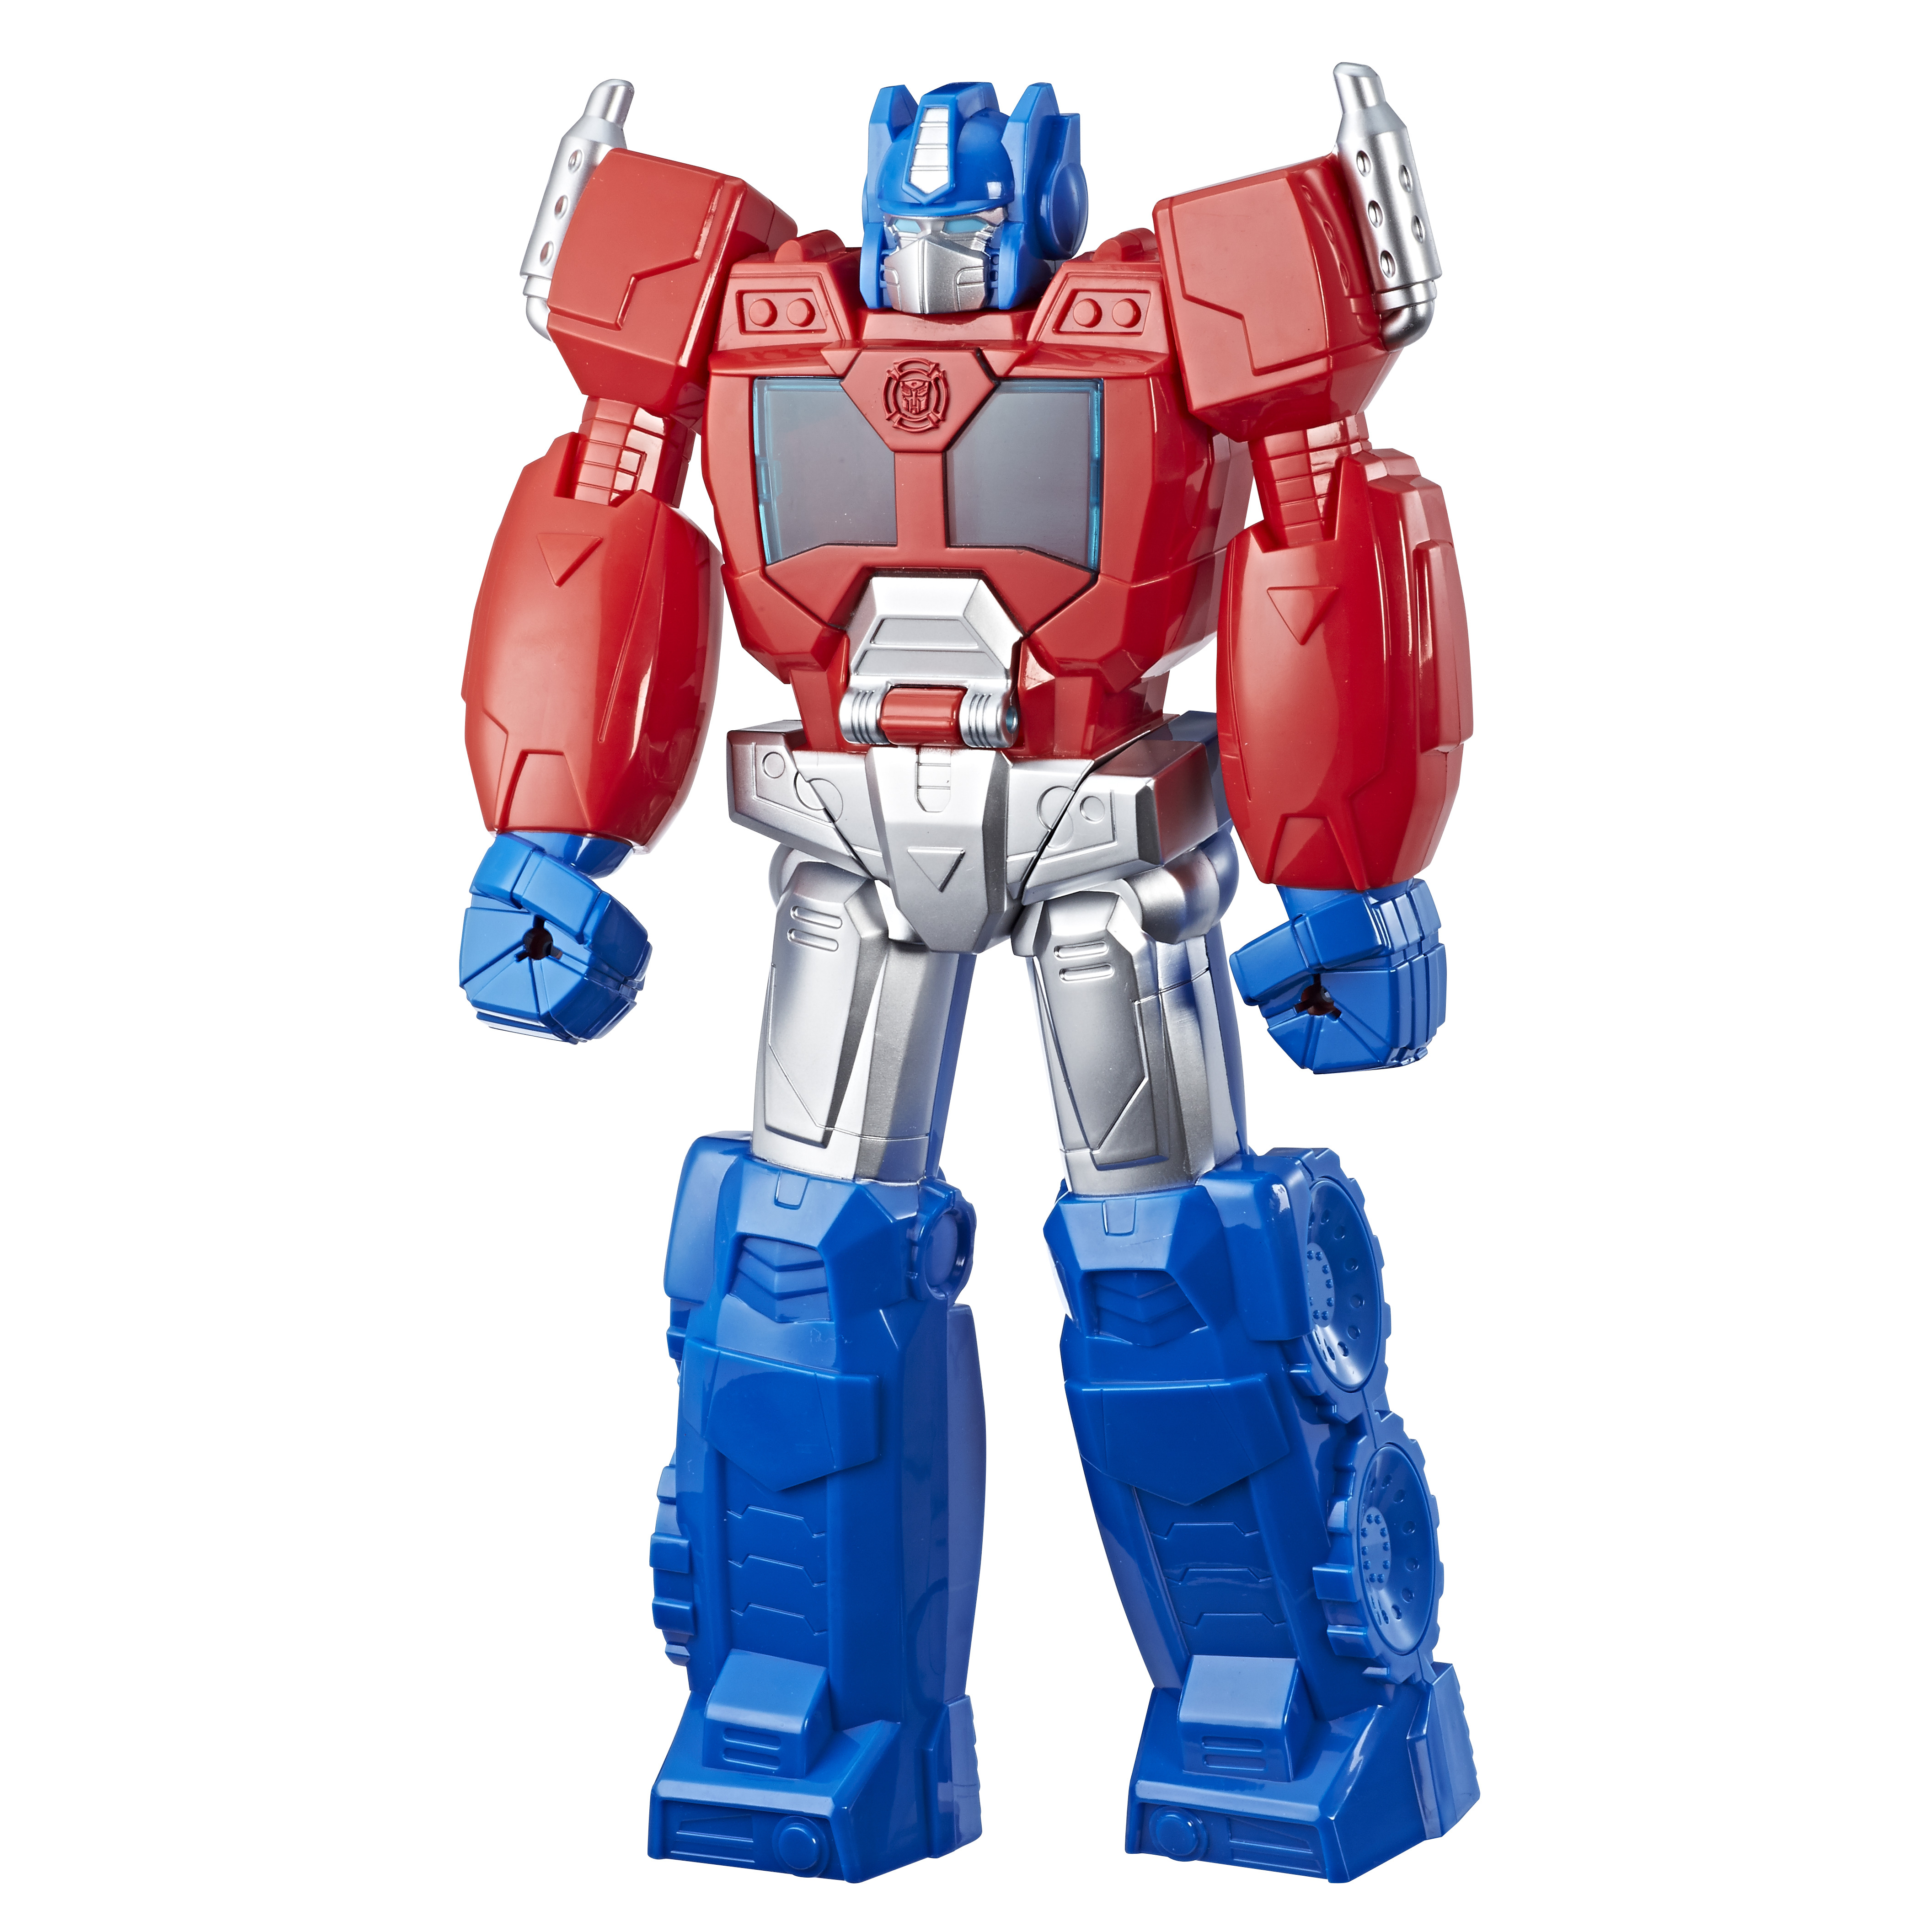 Машинки и мотоциклы Transformers Фигурка Transformers «Rescue Bots» в асс. машинки и мотоциклы transformers фигурка transformers мини титан